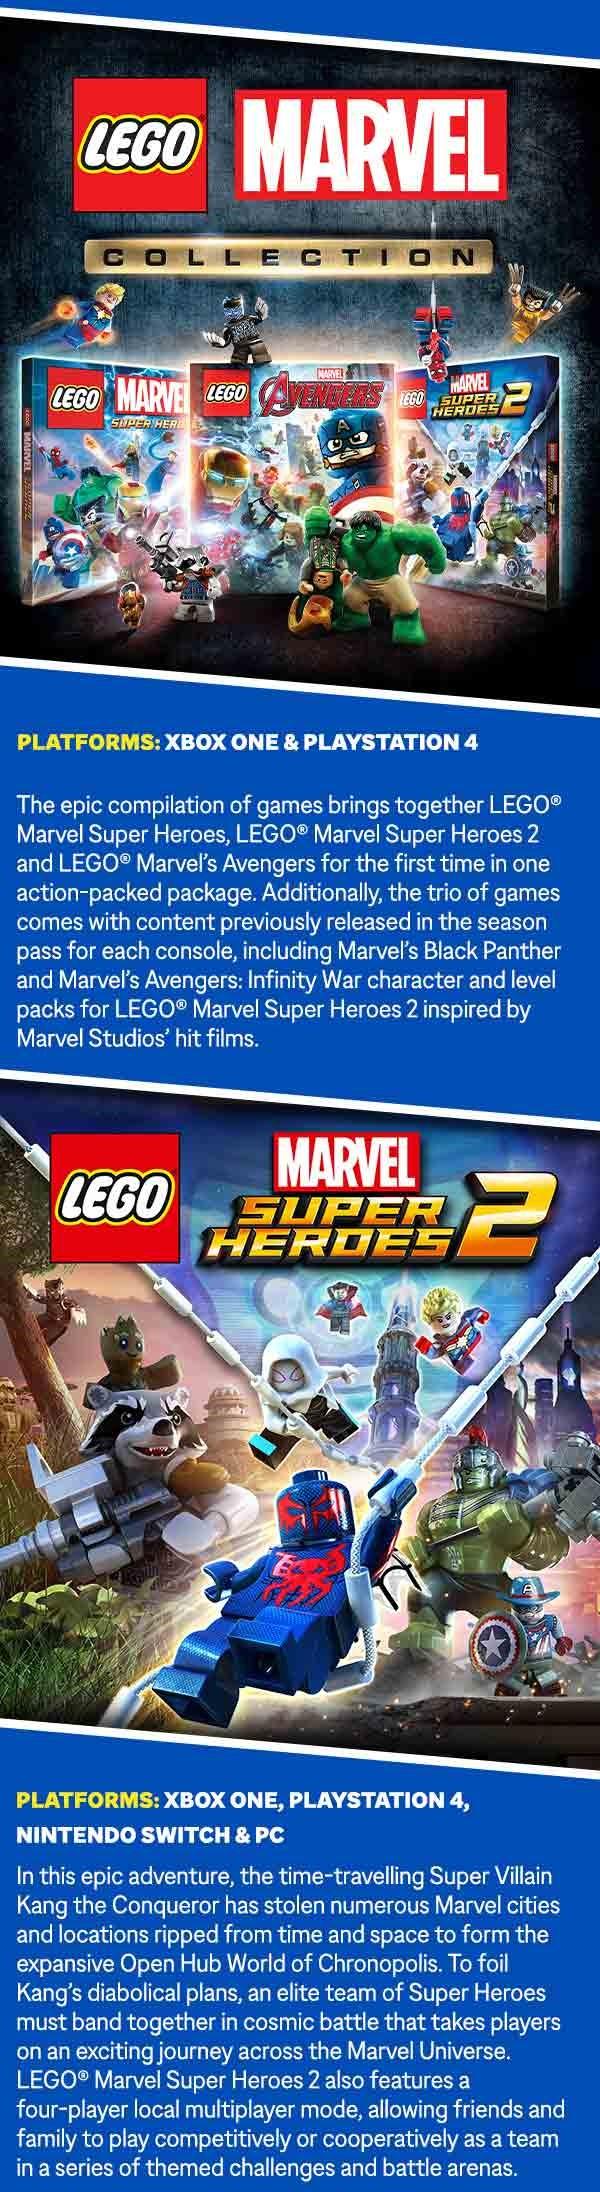 Super Heroes 2 LEGO Artwork